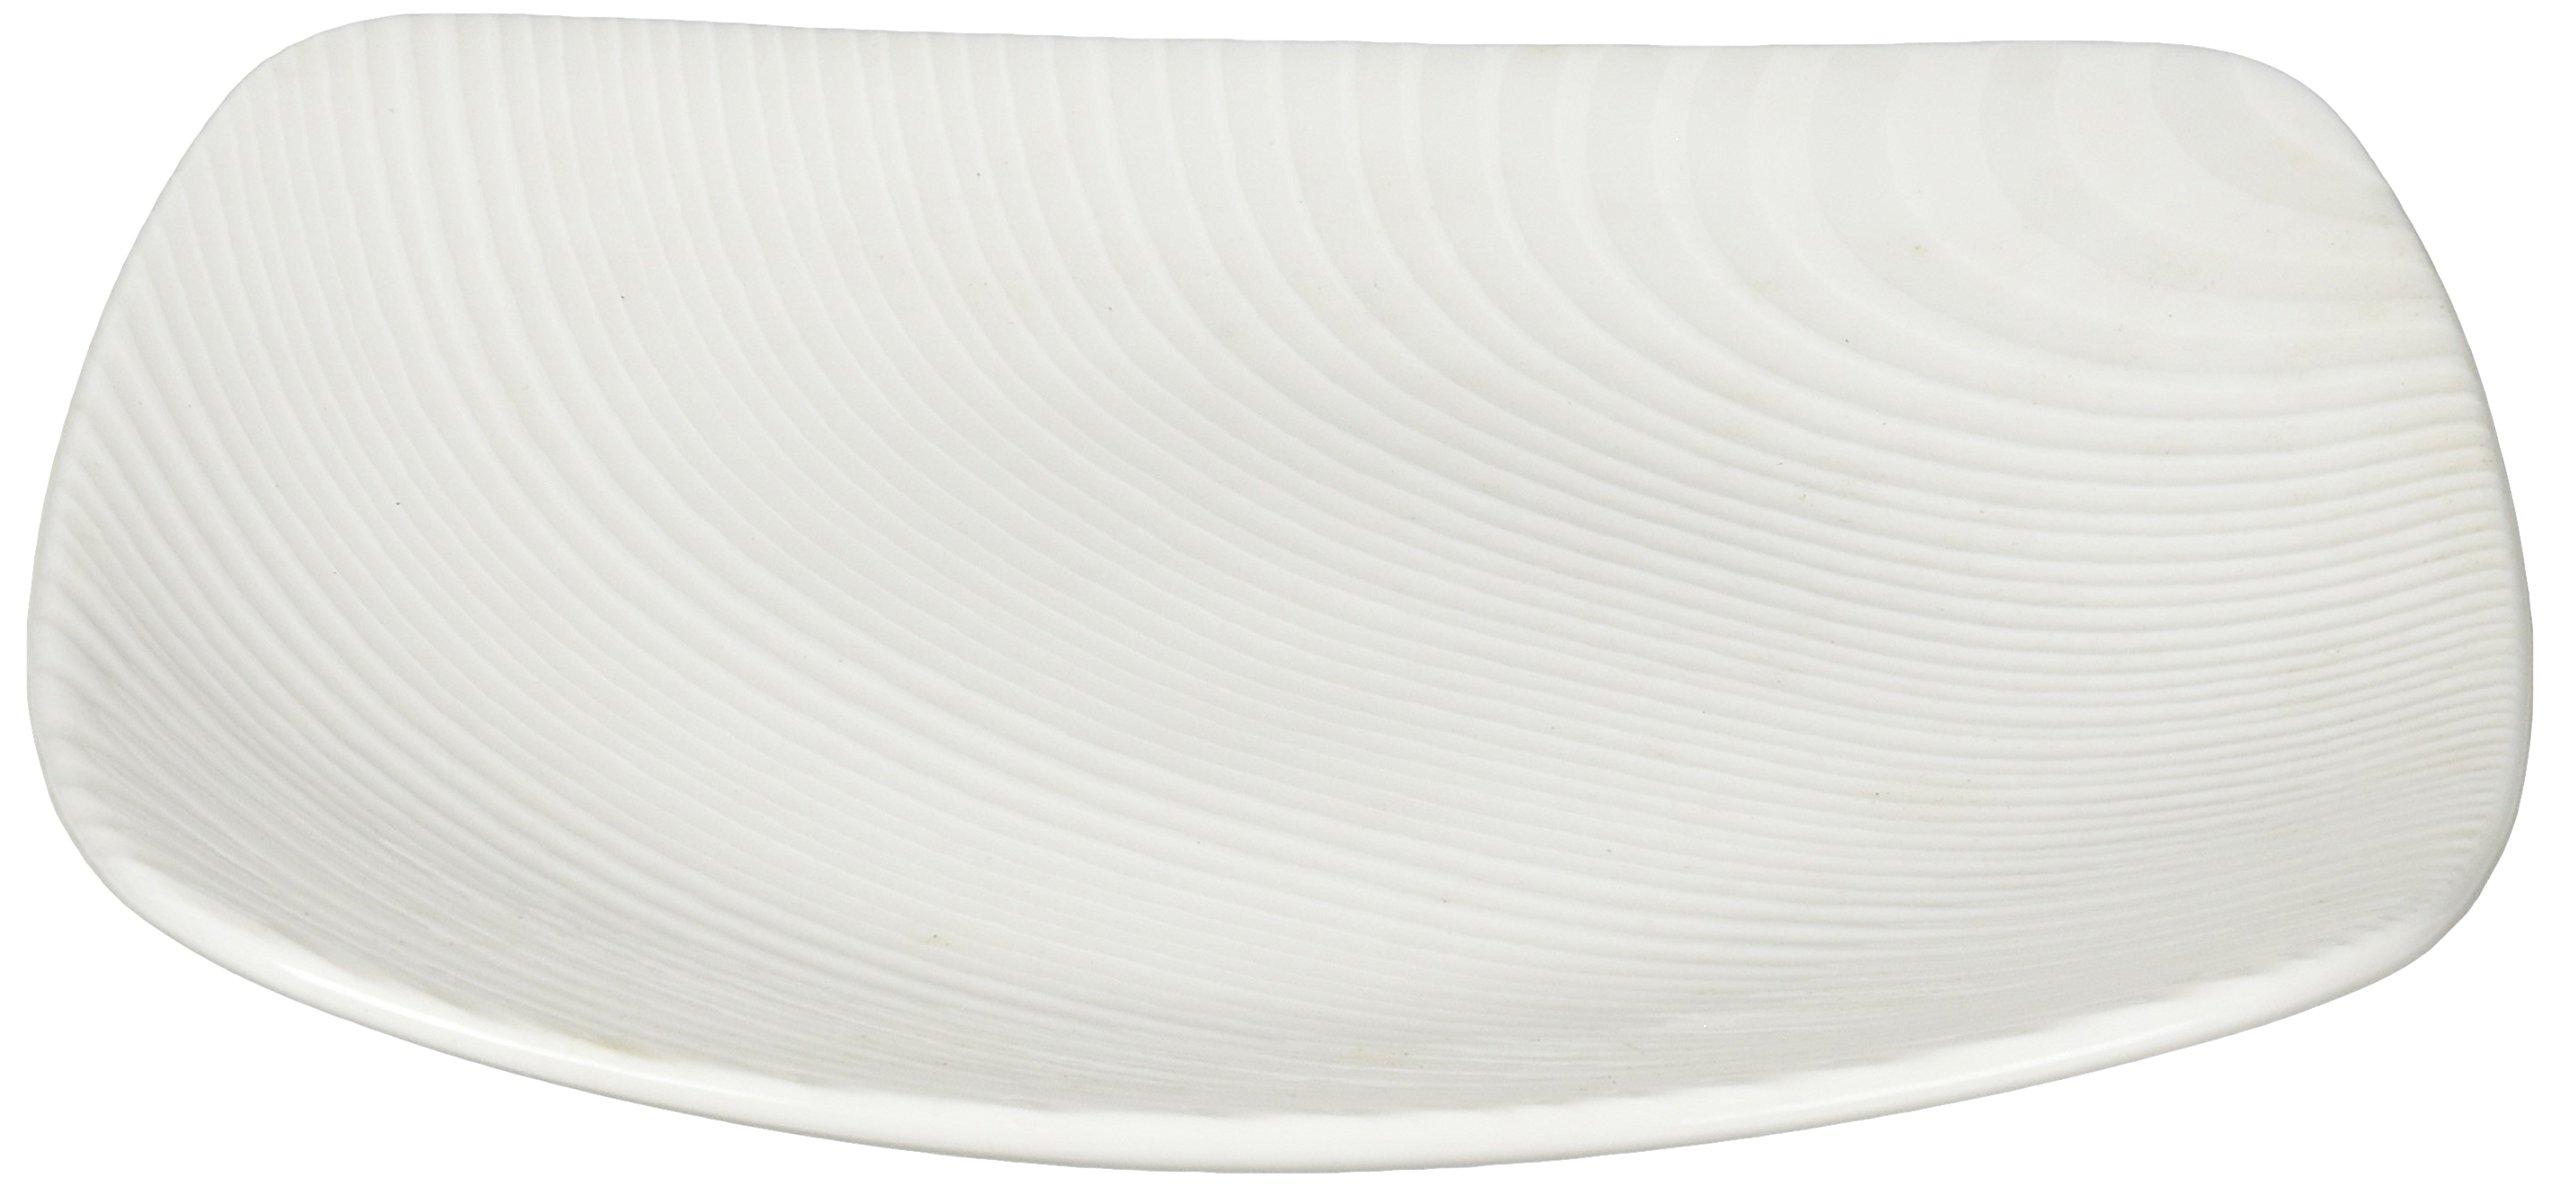 Noritake WOW Dune 6-1/2-Inch Square Plate, Mini